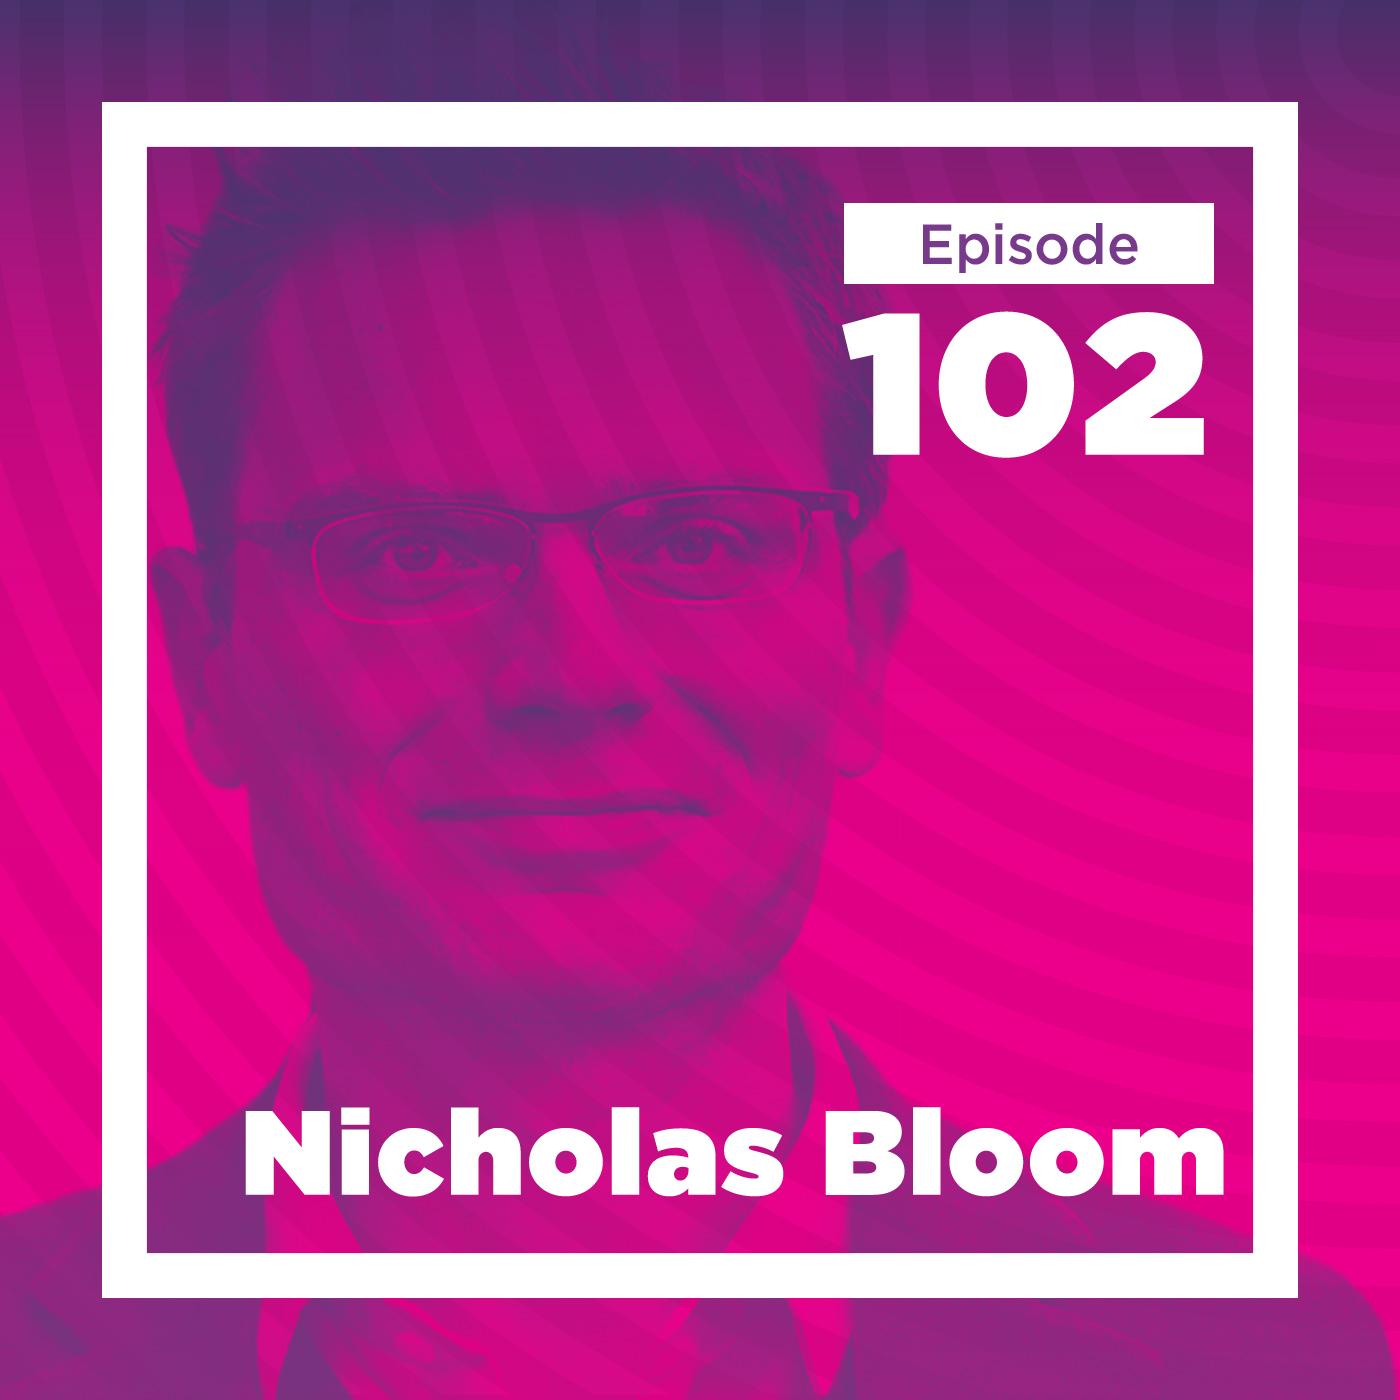 Nicholas Bloom on Management, Productivity, and Scientific Progress